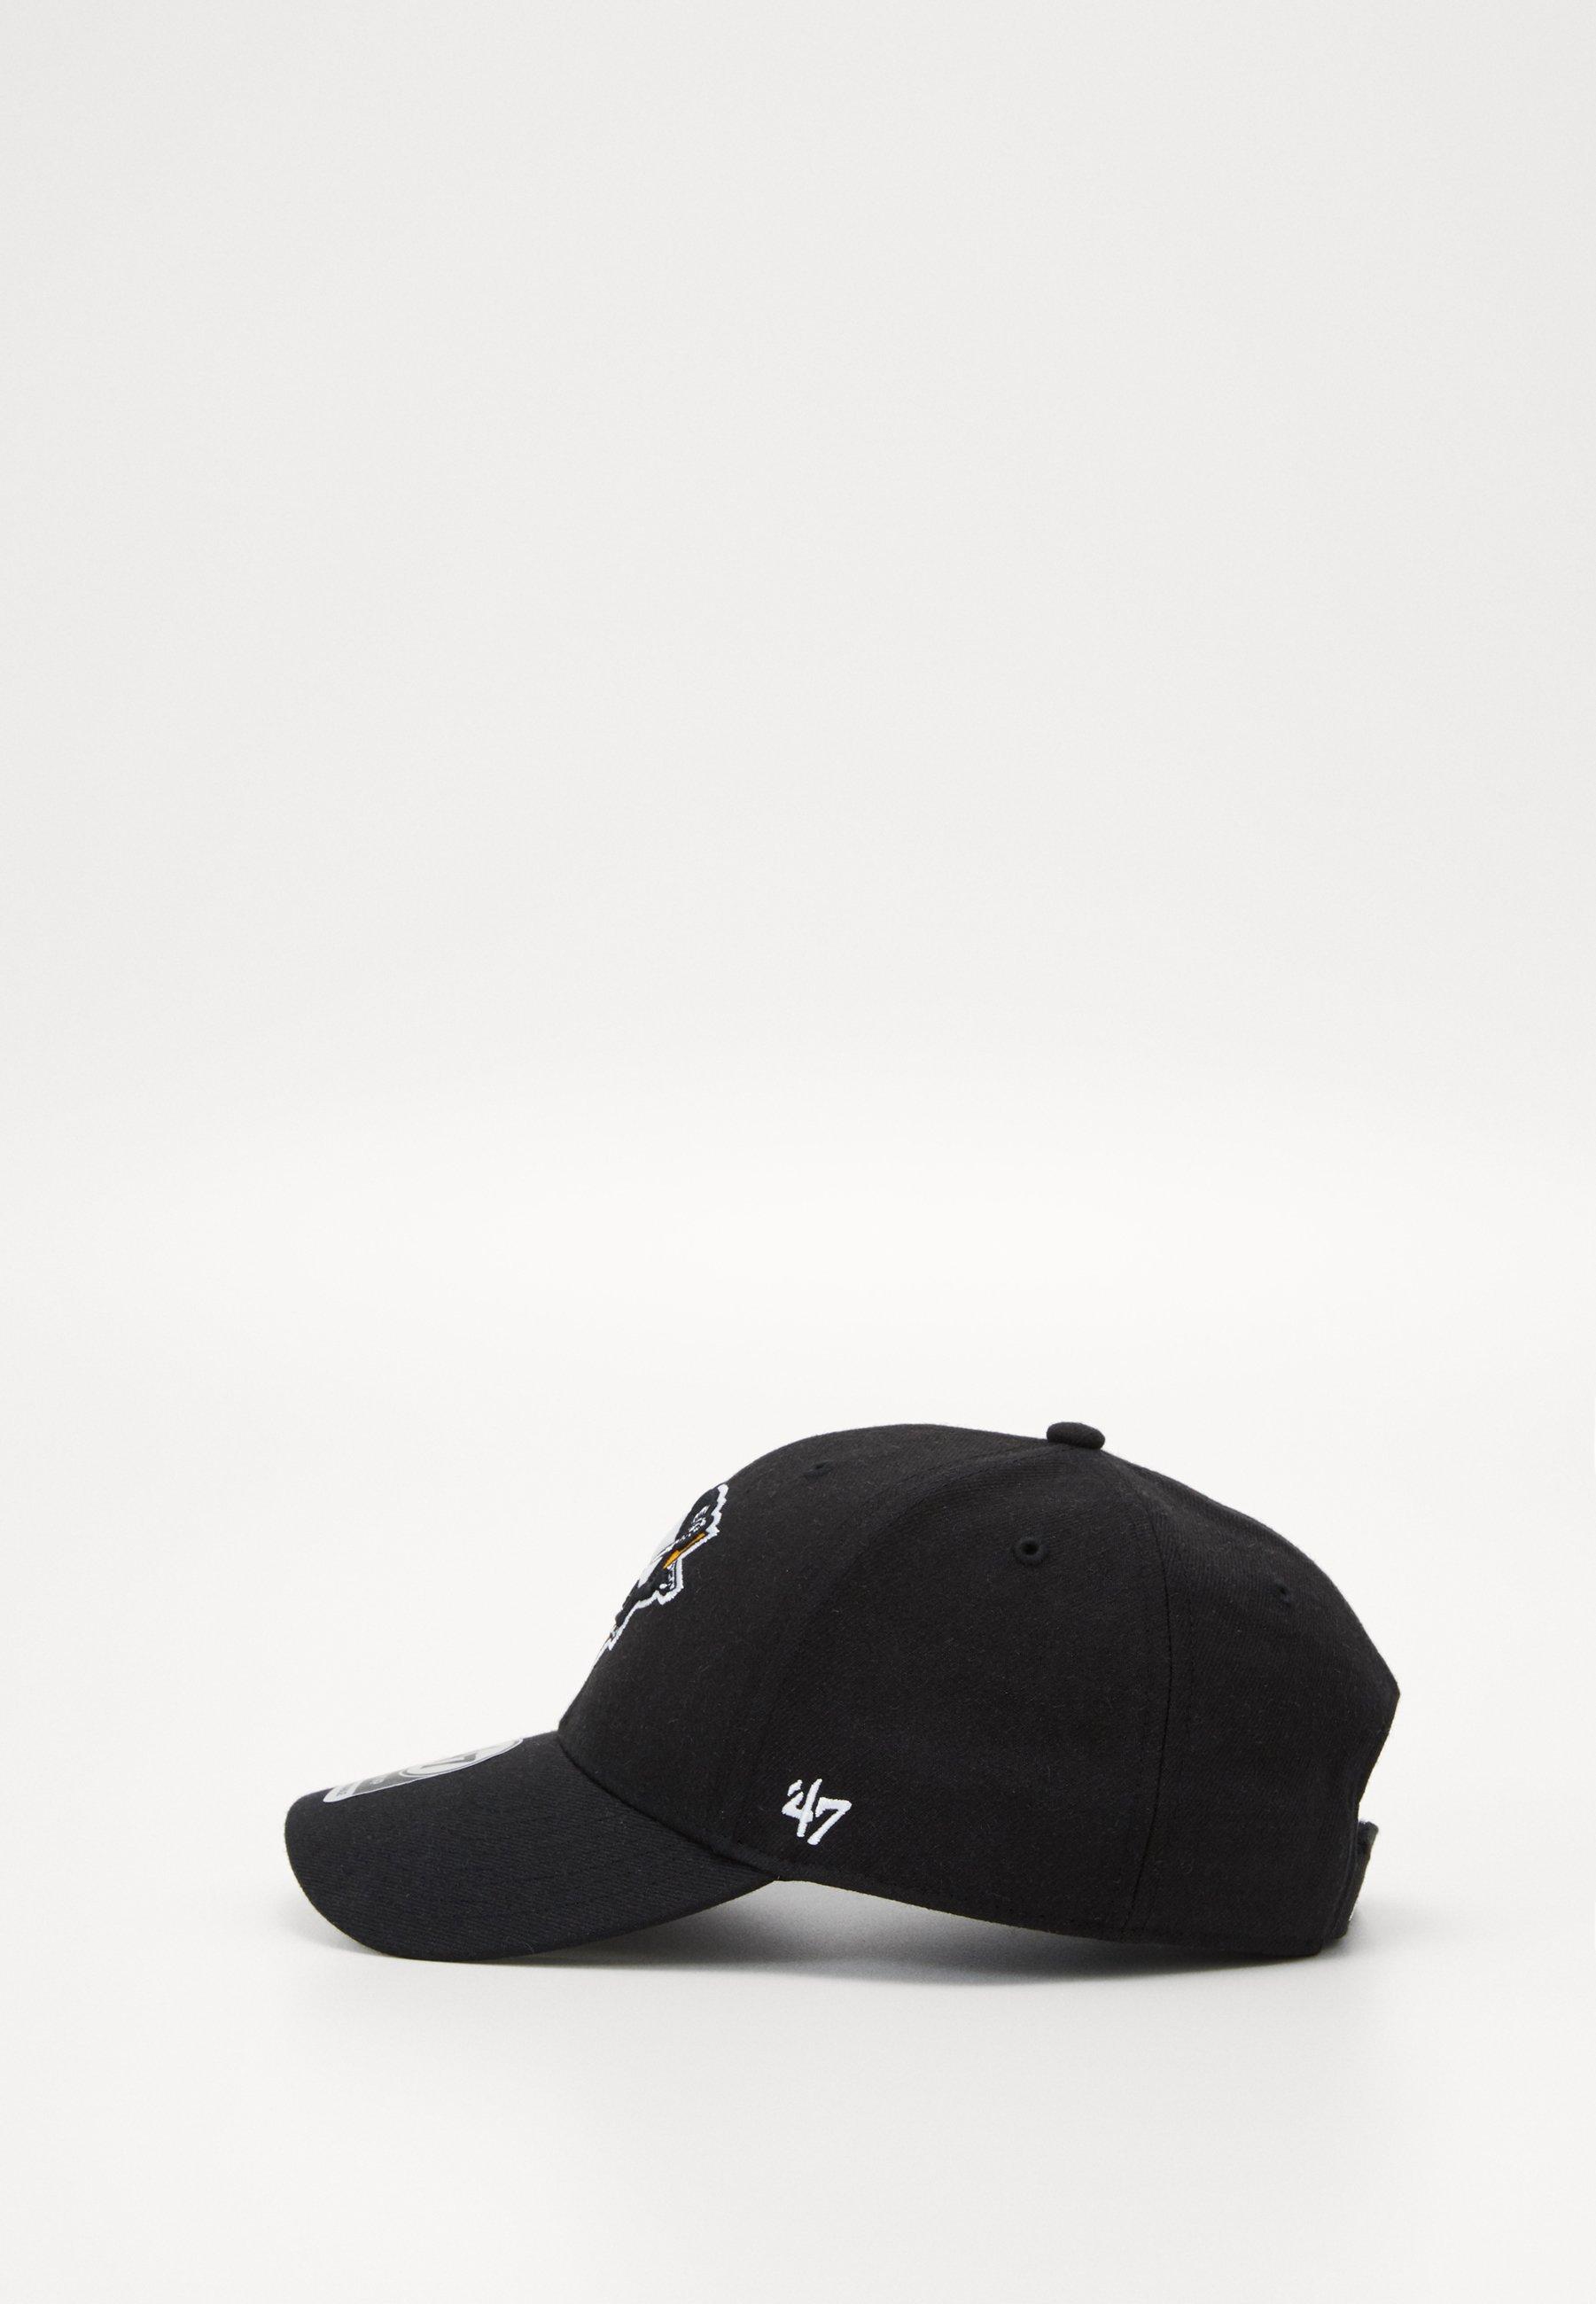 '47 NHL PITTSBURGH PENGUINS - Cap - black/svart TqUN0Eic3QHyi3C